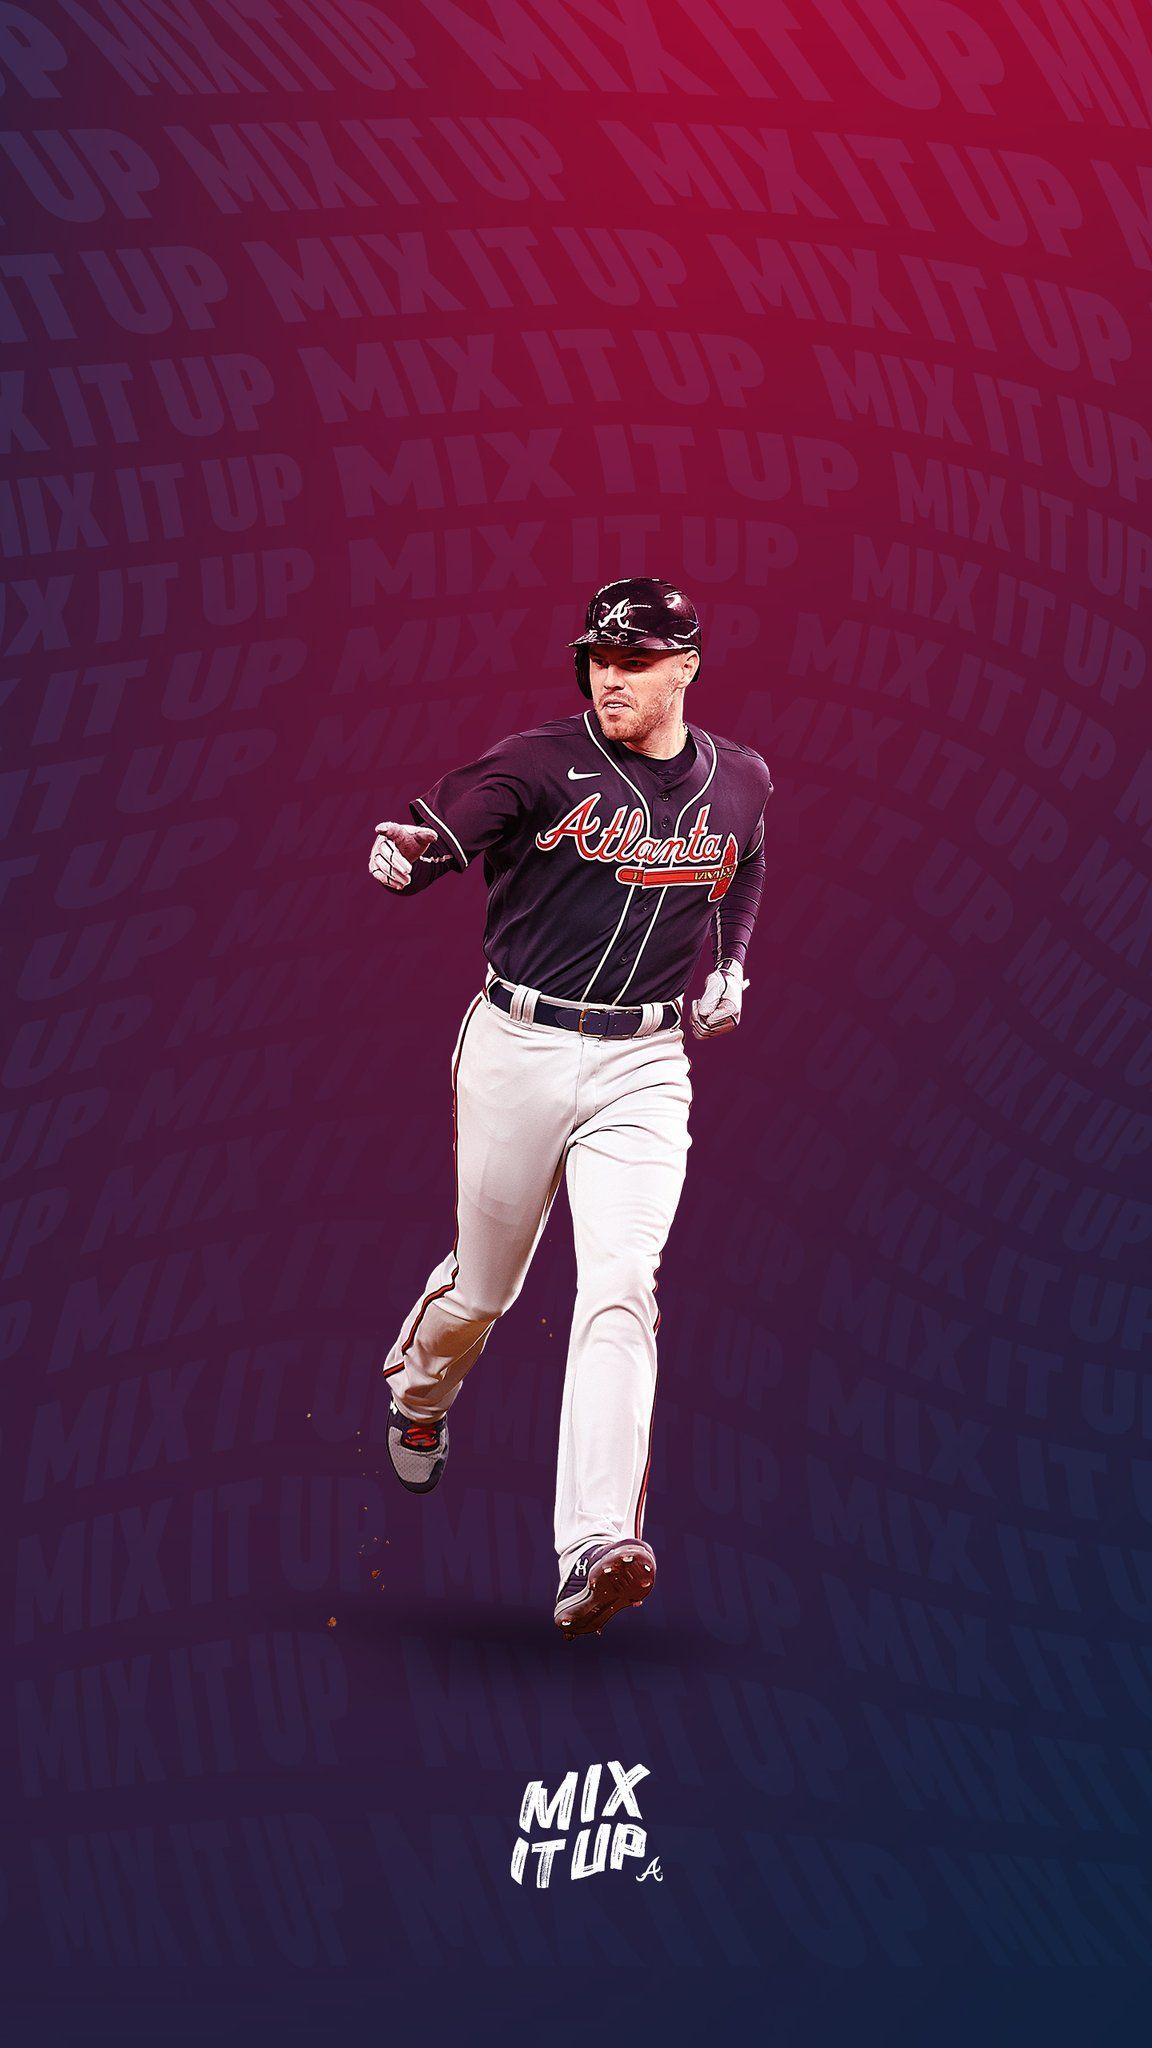 Atlanta Braves On Twitter In 2021 Atlanta Braves Atlanta Braves Wallpaper Braves